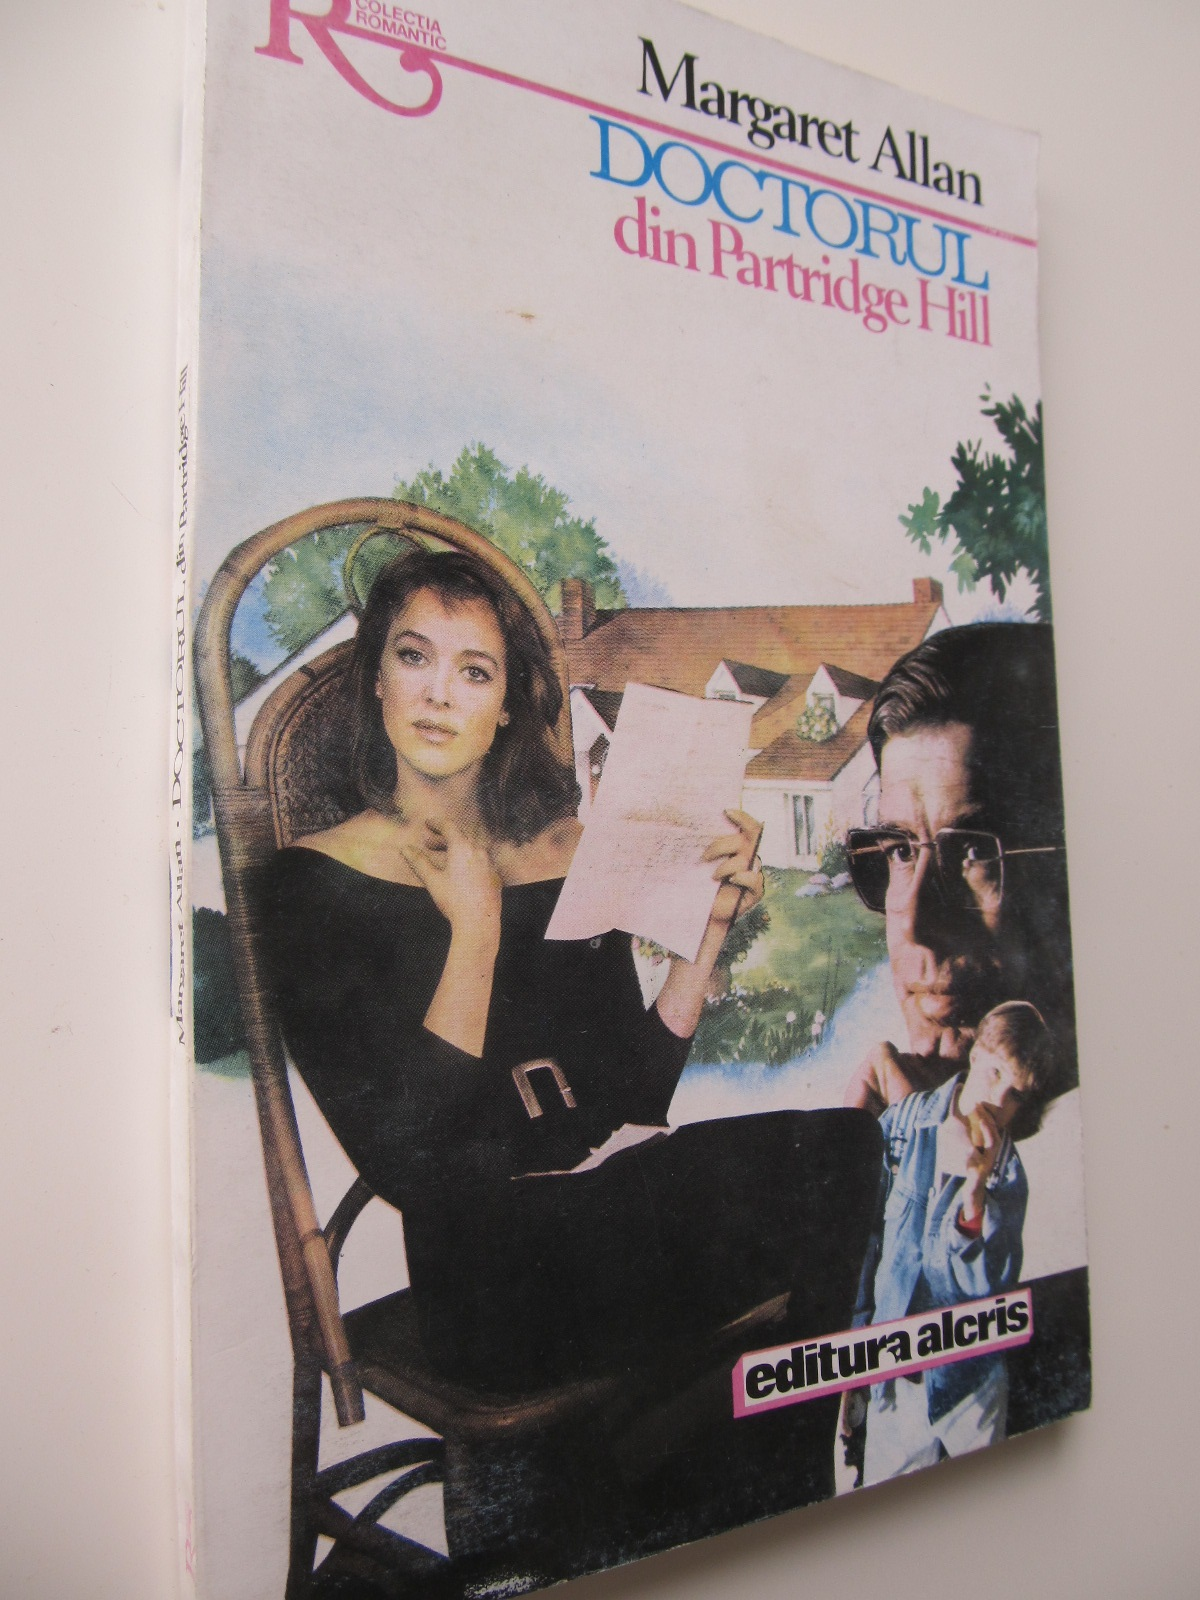 Doctorul din Patridge Hill (2) - Margaret Allan | Detalii carte